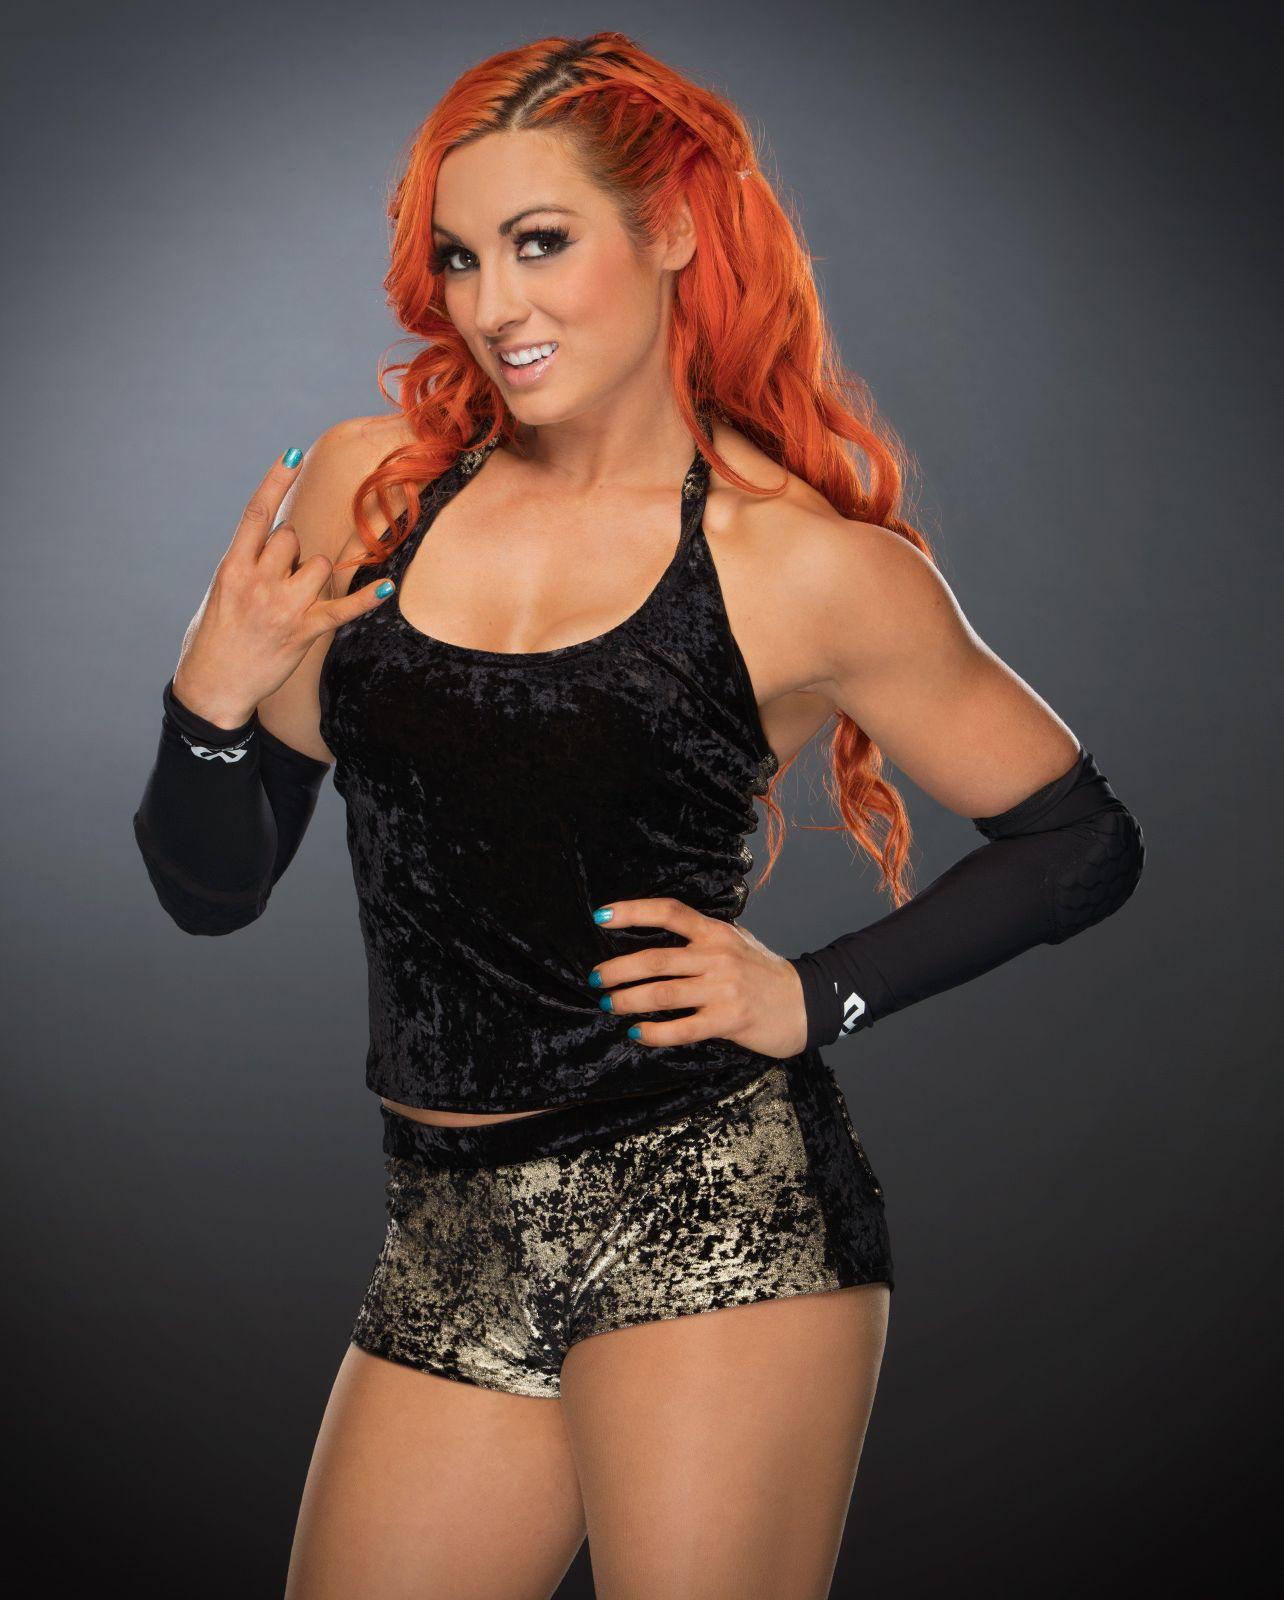 Becky lynch hot